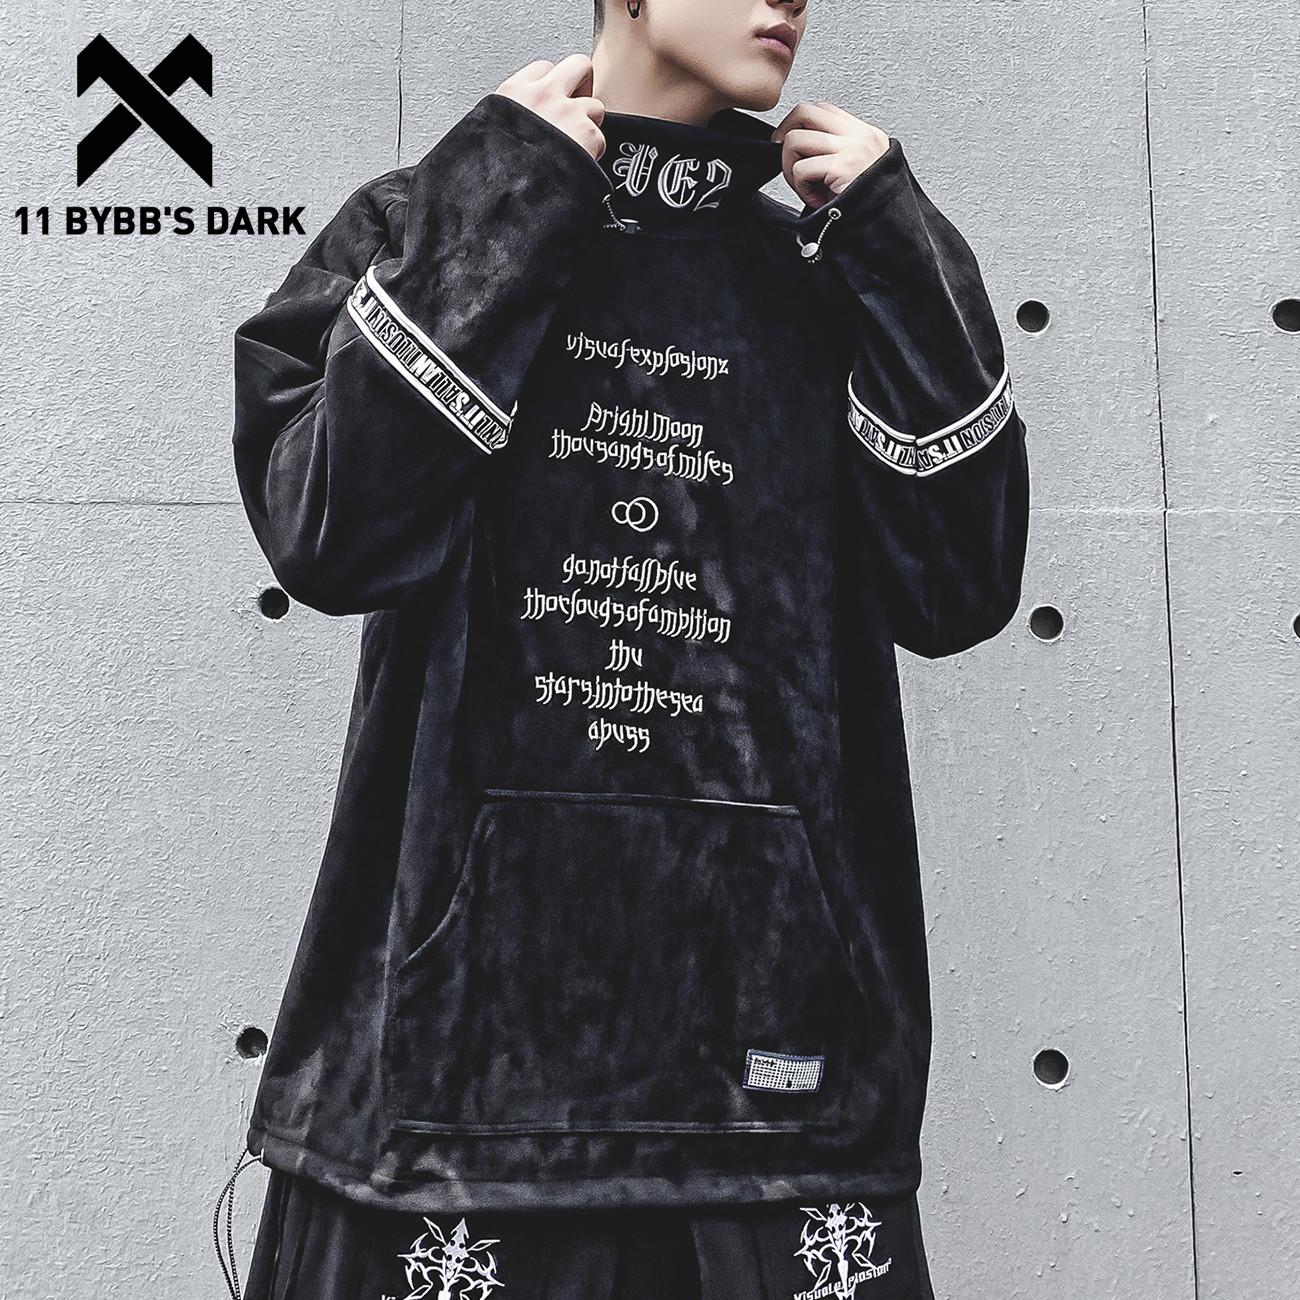 11 BYBB'S KOYU Vintage Nakış Hip Hop 1019 Hoodie Techwear Taktik Streetwear Hoodie Kazak Erkek Streetwear Kazak Pamuk